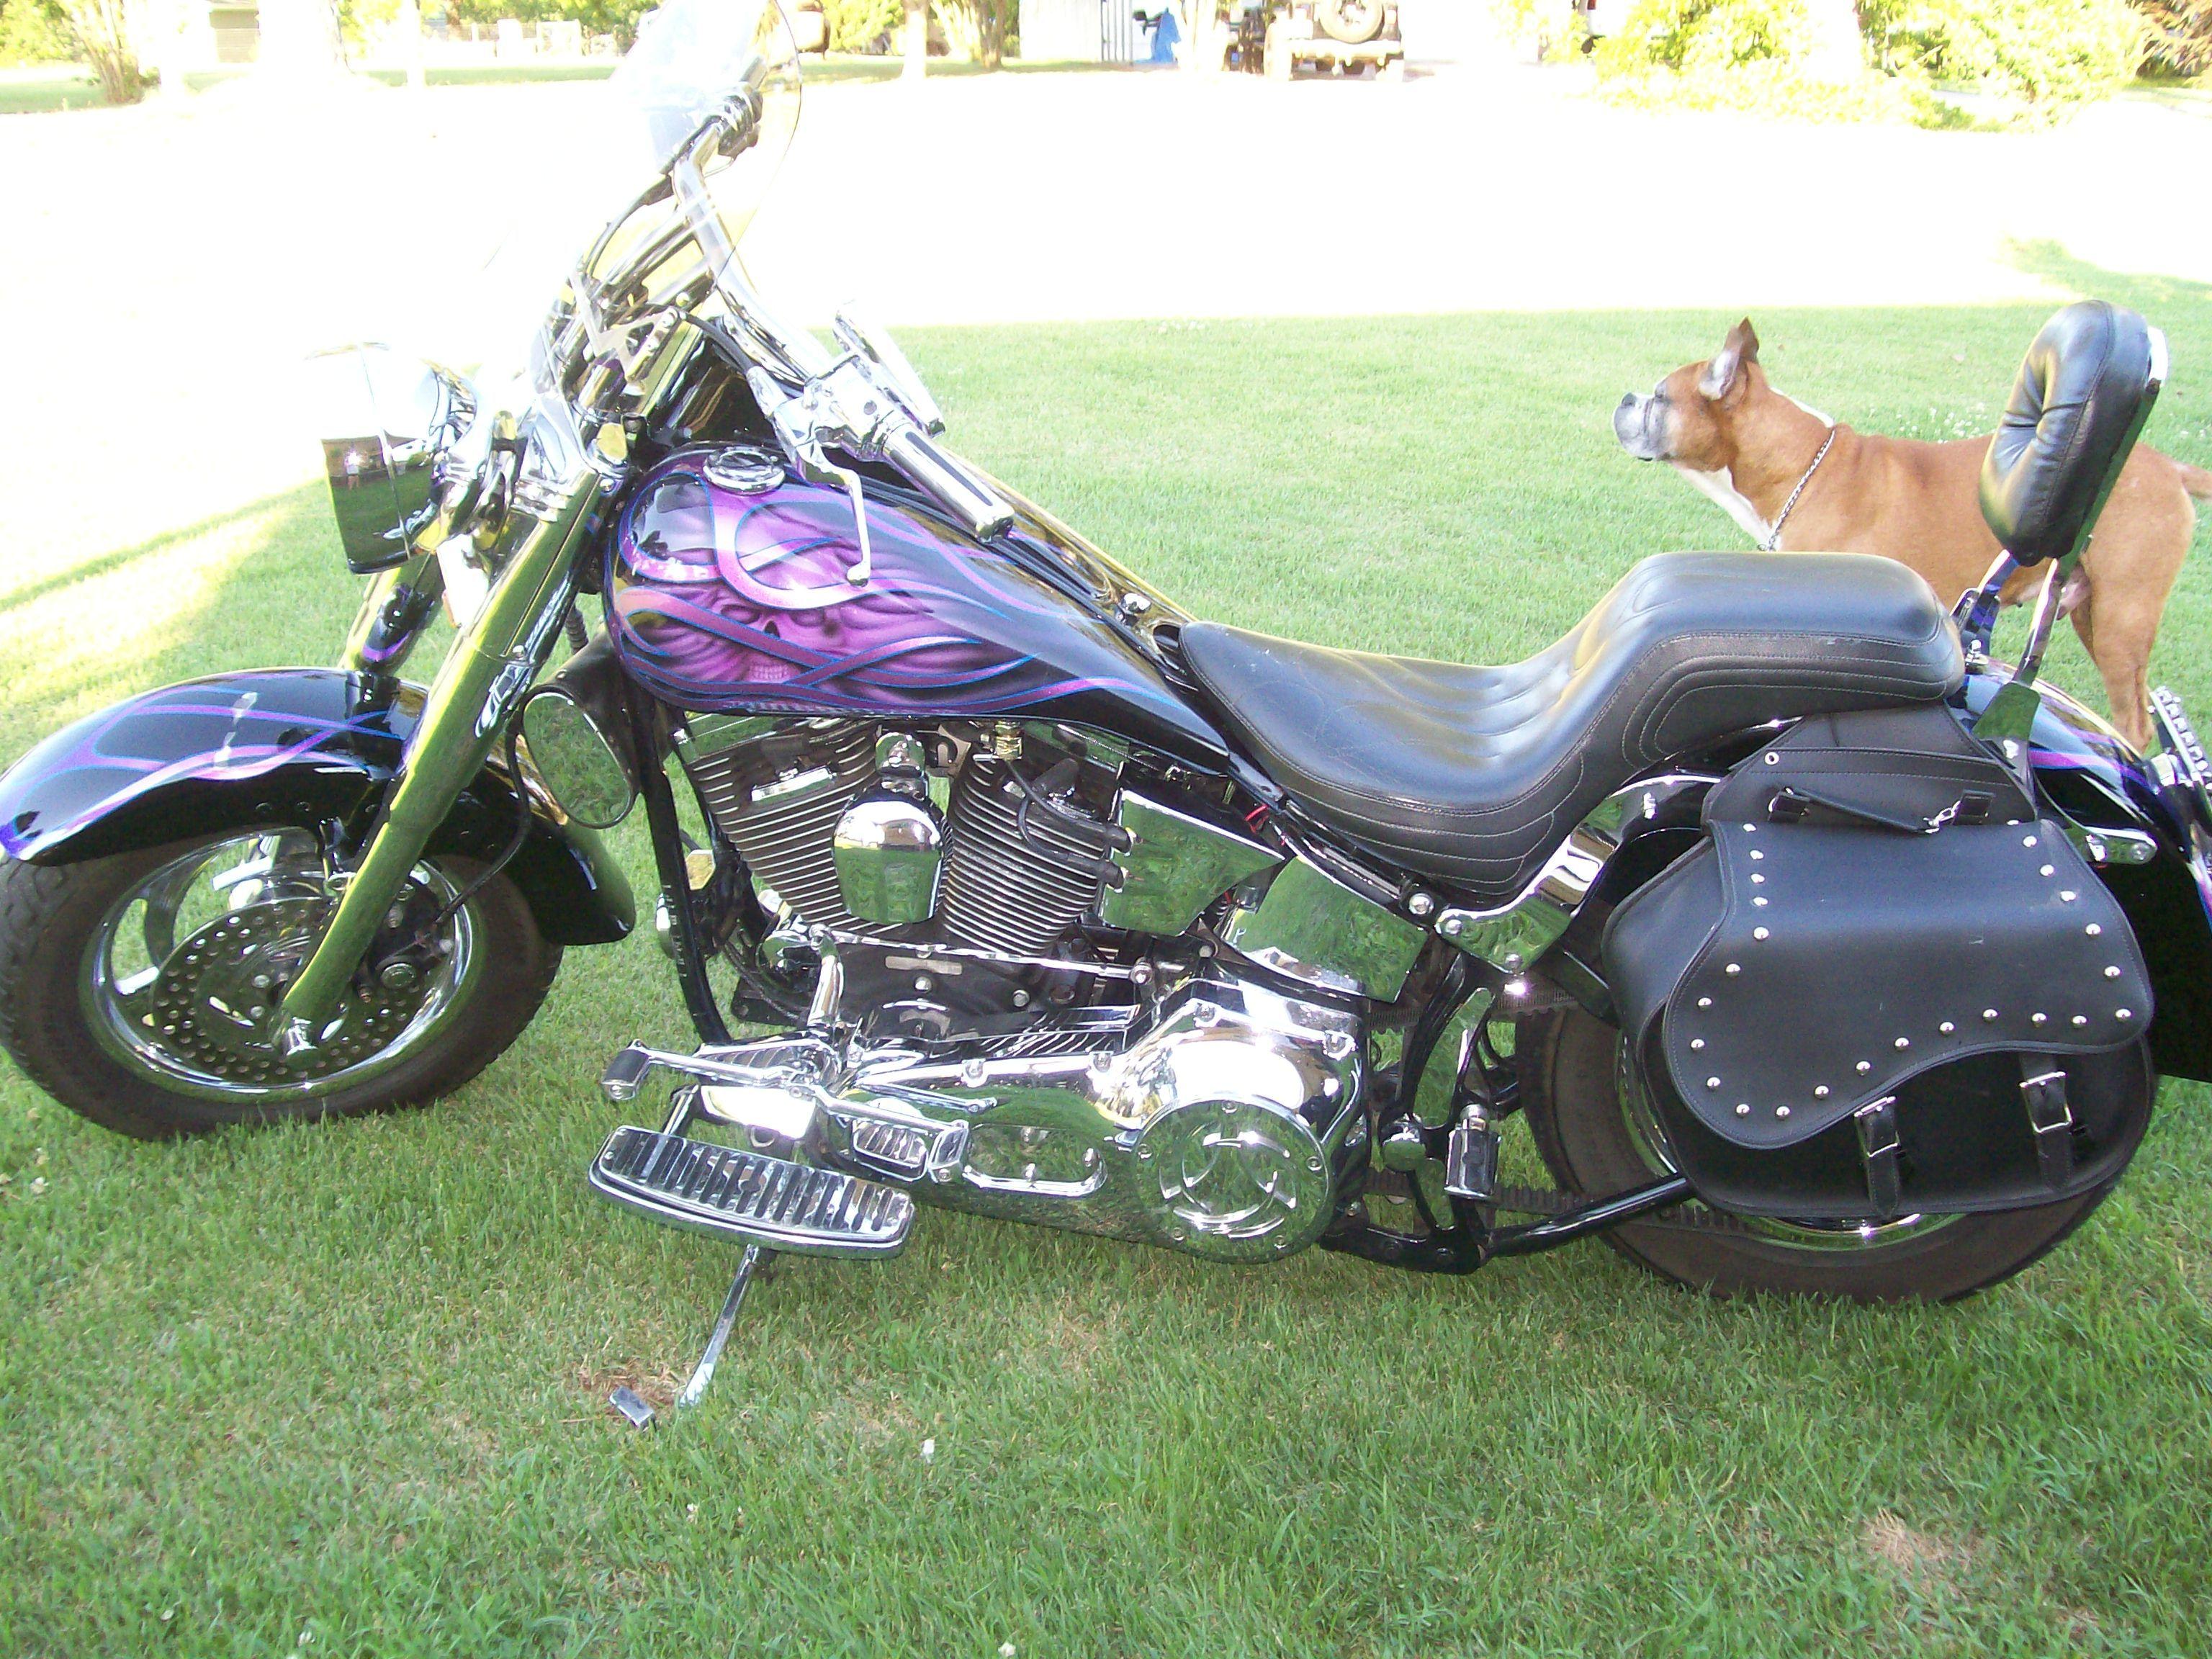 99 Harley Davidson Heritage Softail Classic